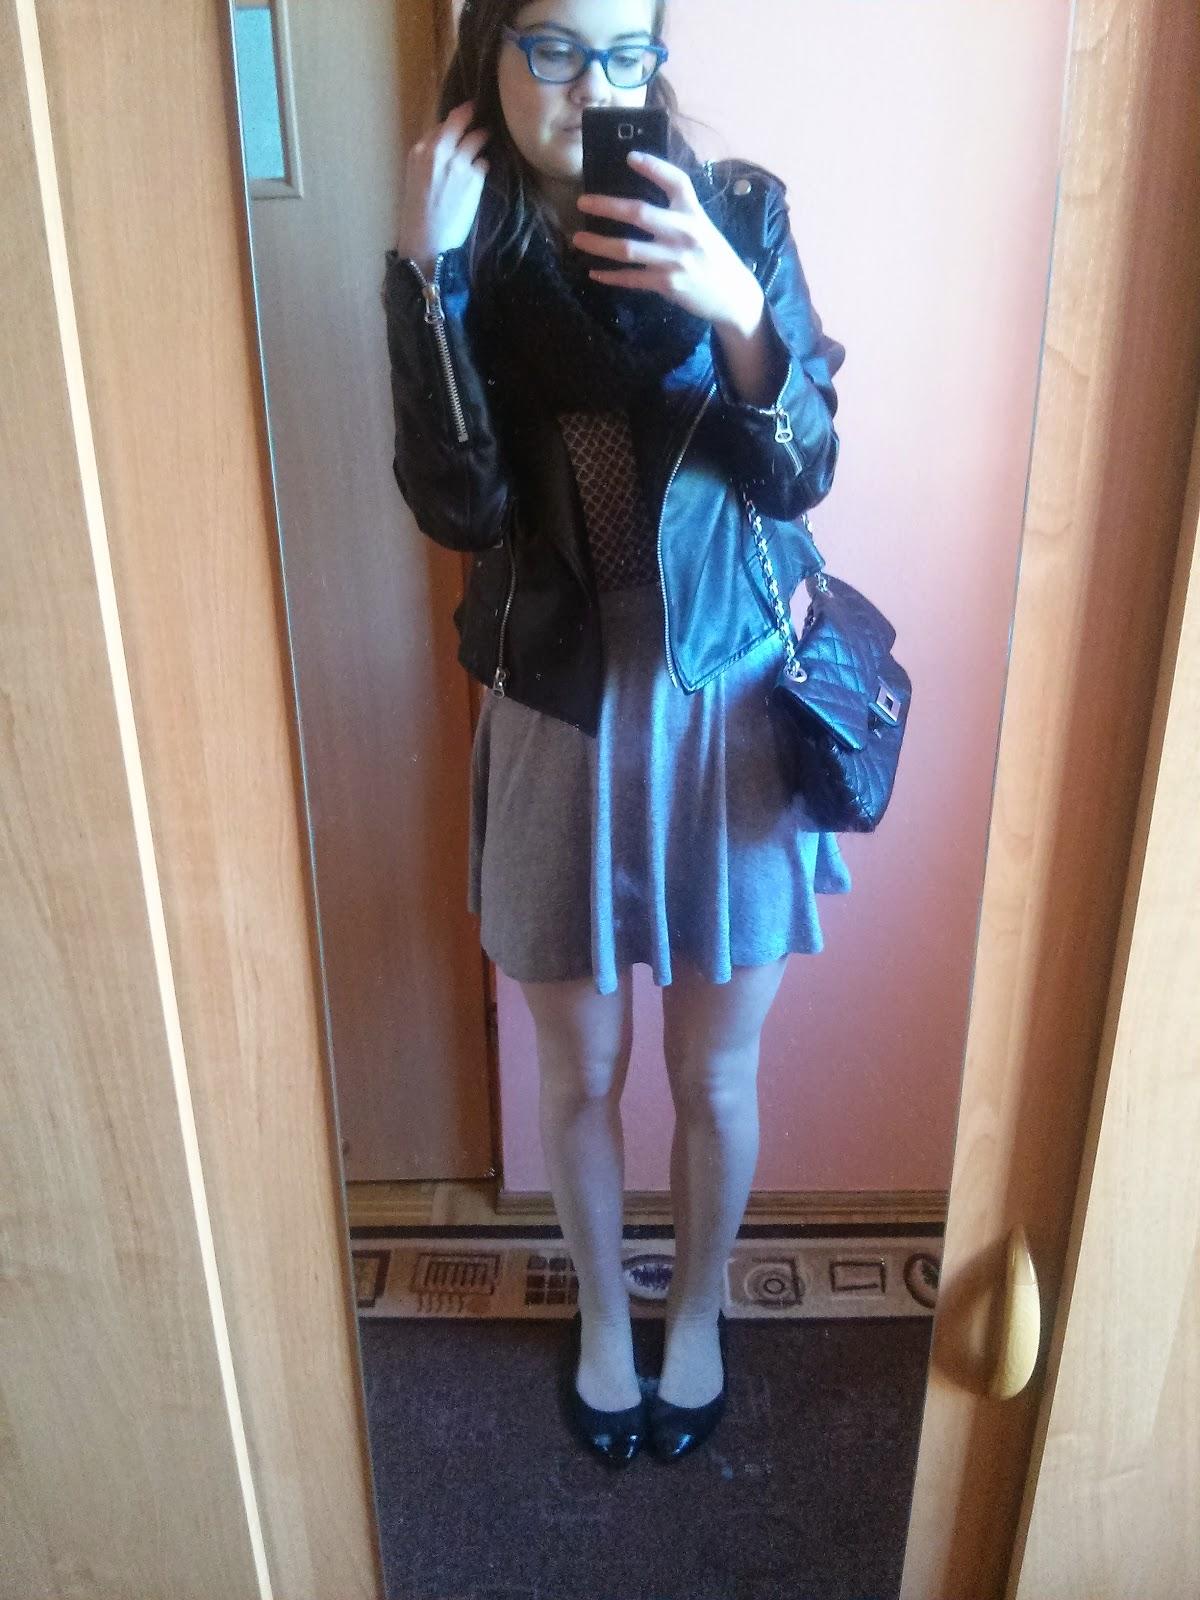 OOTD: Bluzka z nadrukiem a'la koc babci+ szara skater skirt